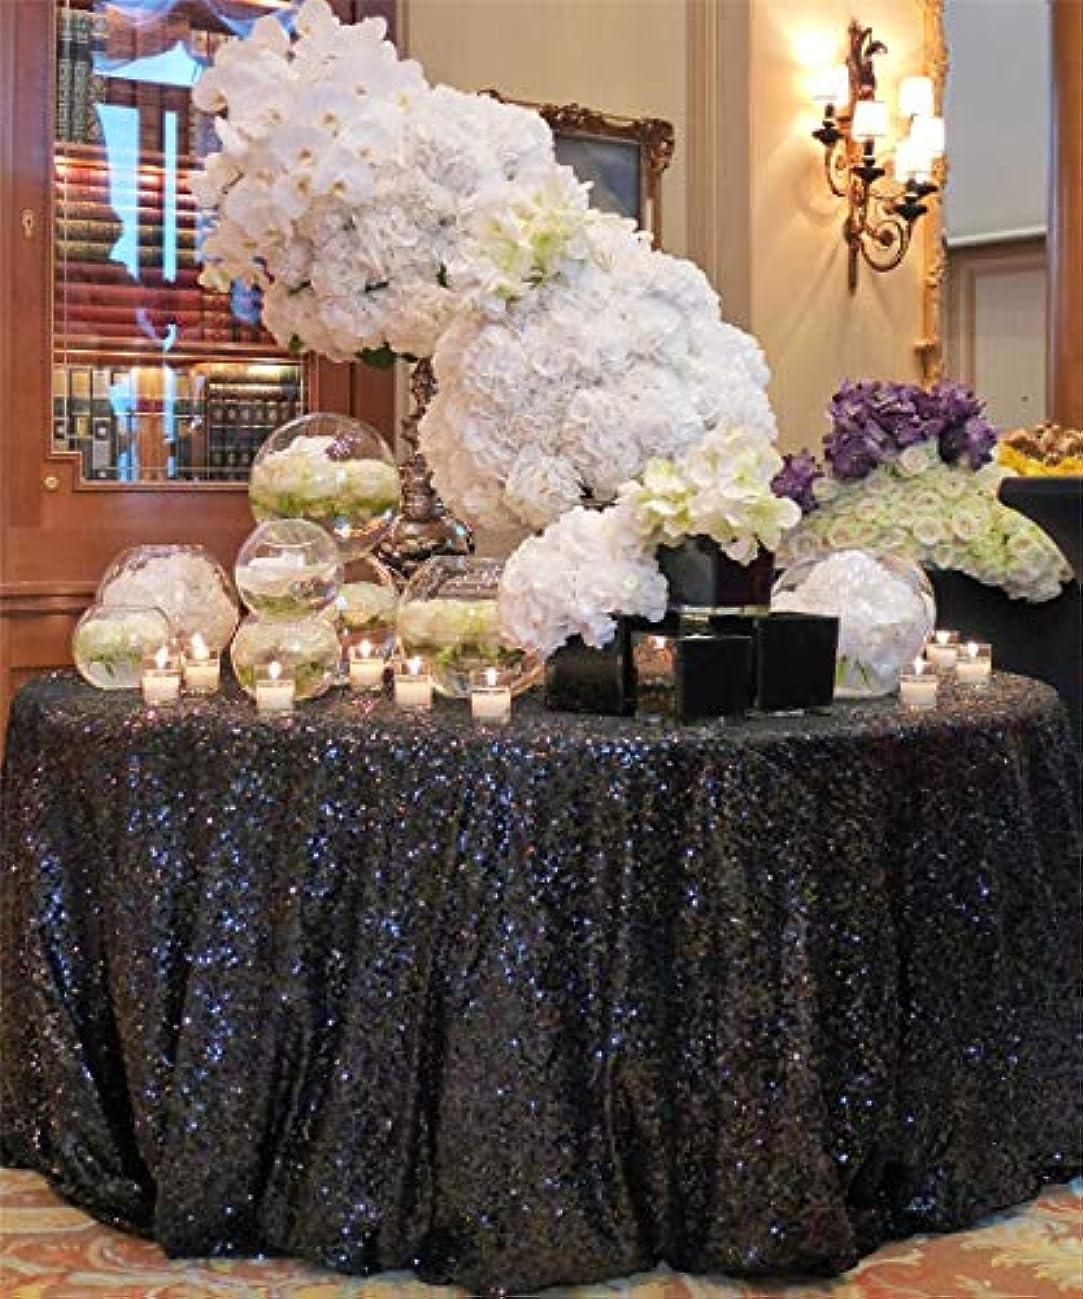 QueenDream Glitter Black Sequin Tablecloth 120